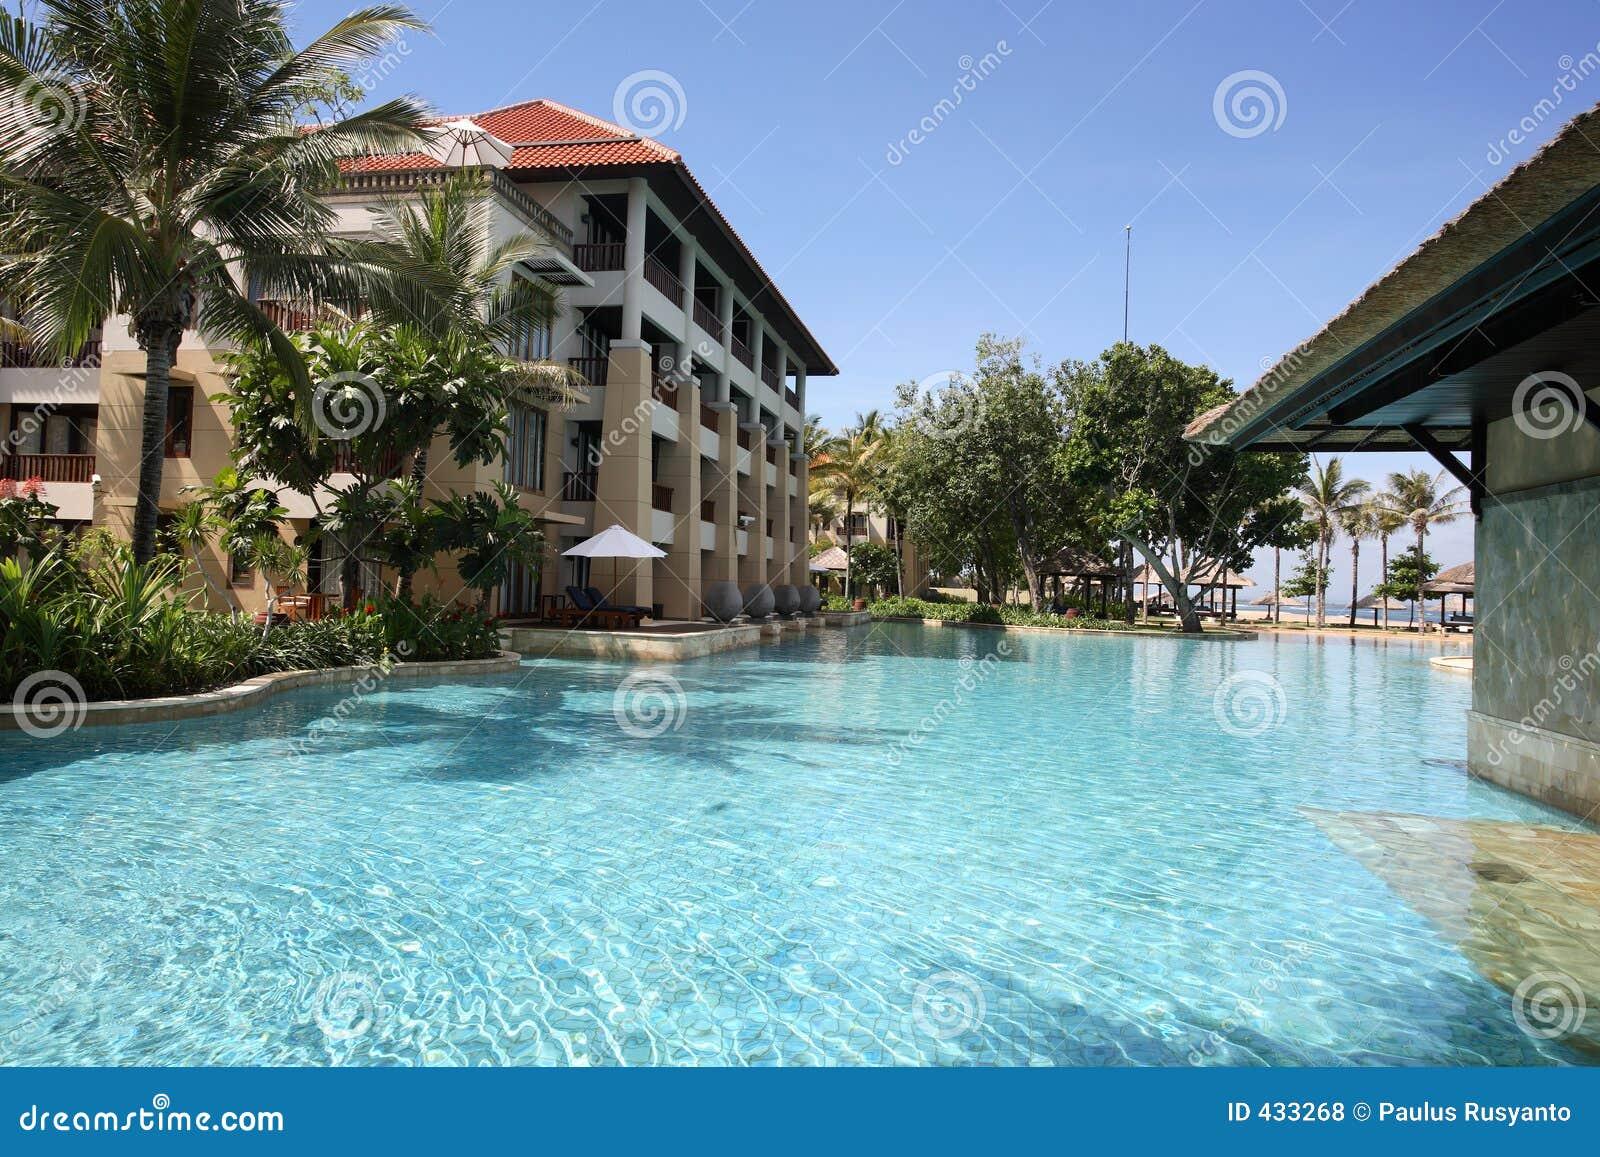 Big Swimming Pool Royalty Free Stock Photos Image 433268